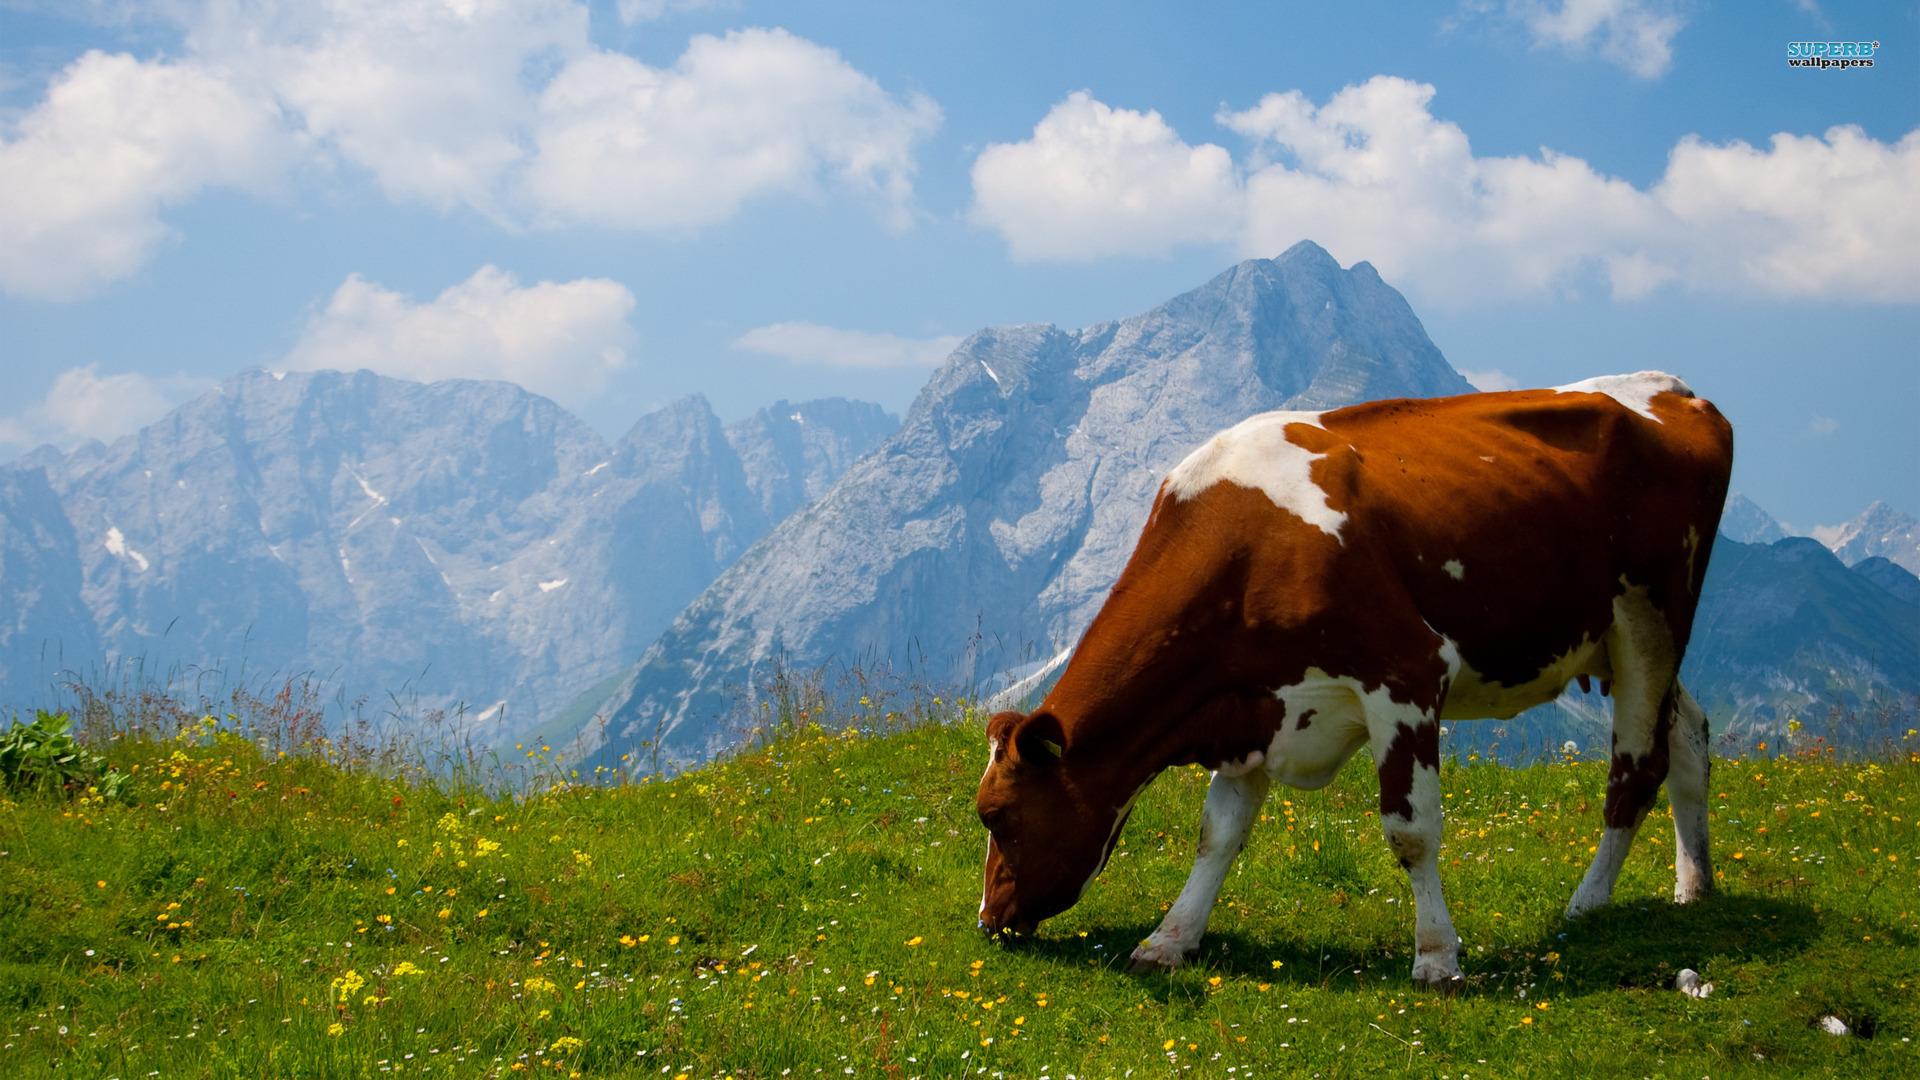 Cow Wallpaper